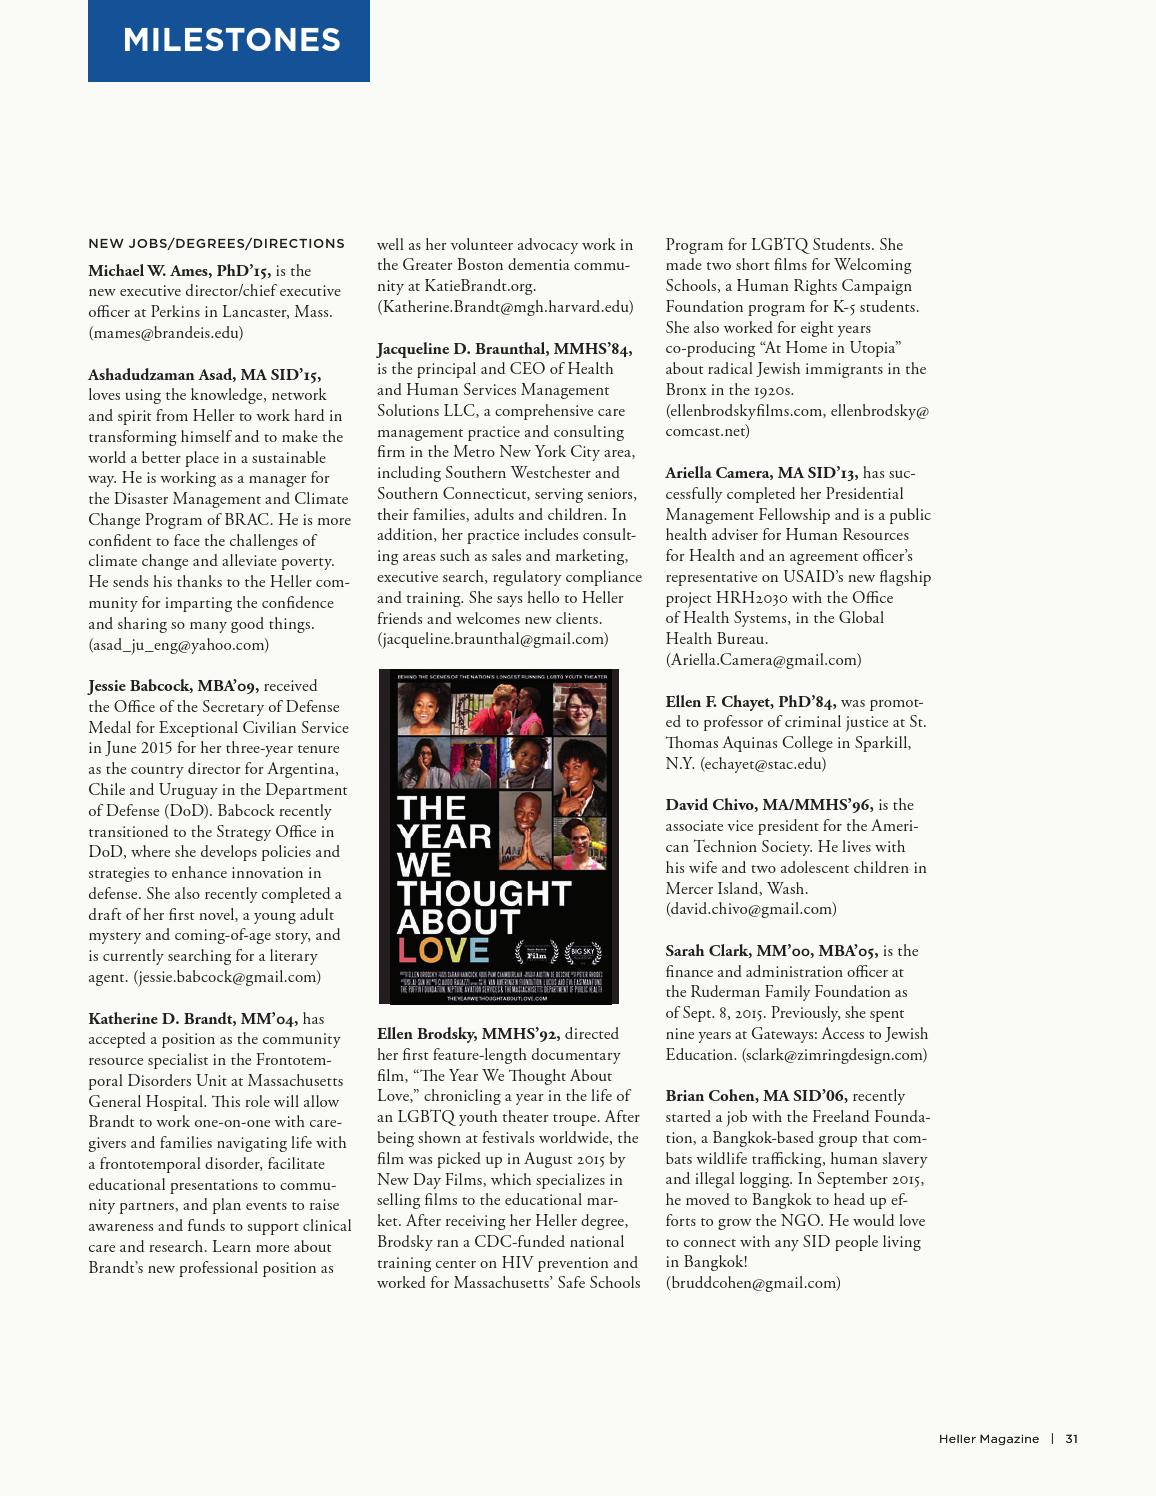 Heller Magazine, Winter 2016 by Brandeis University - issuu